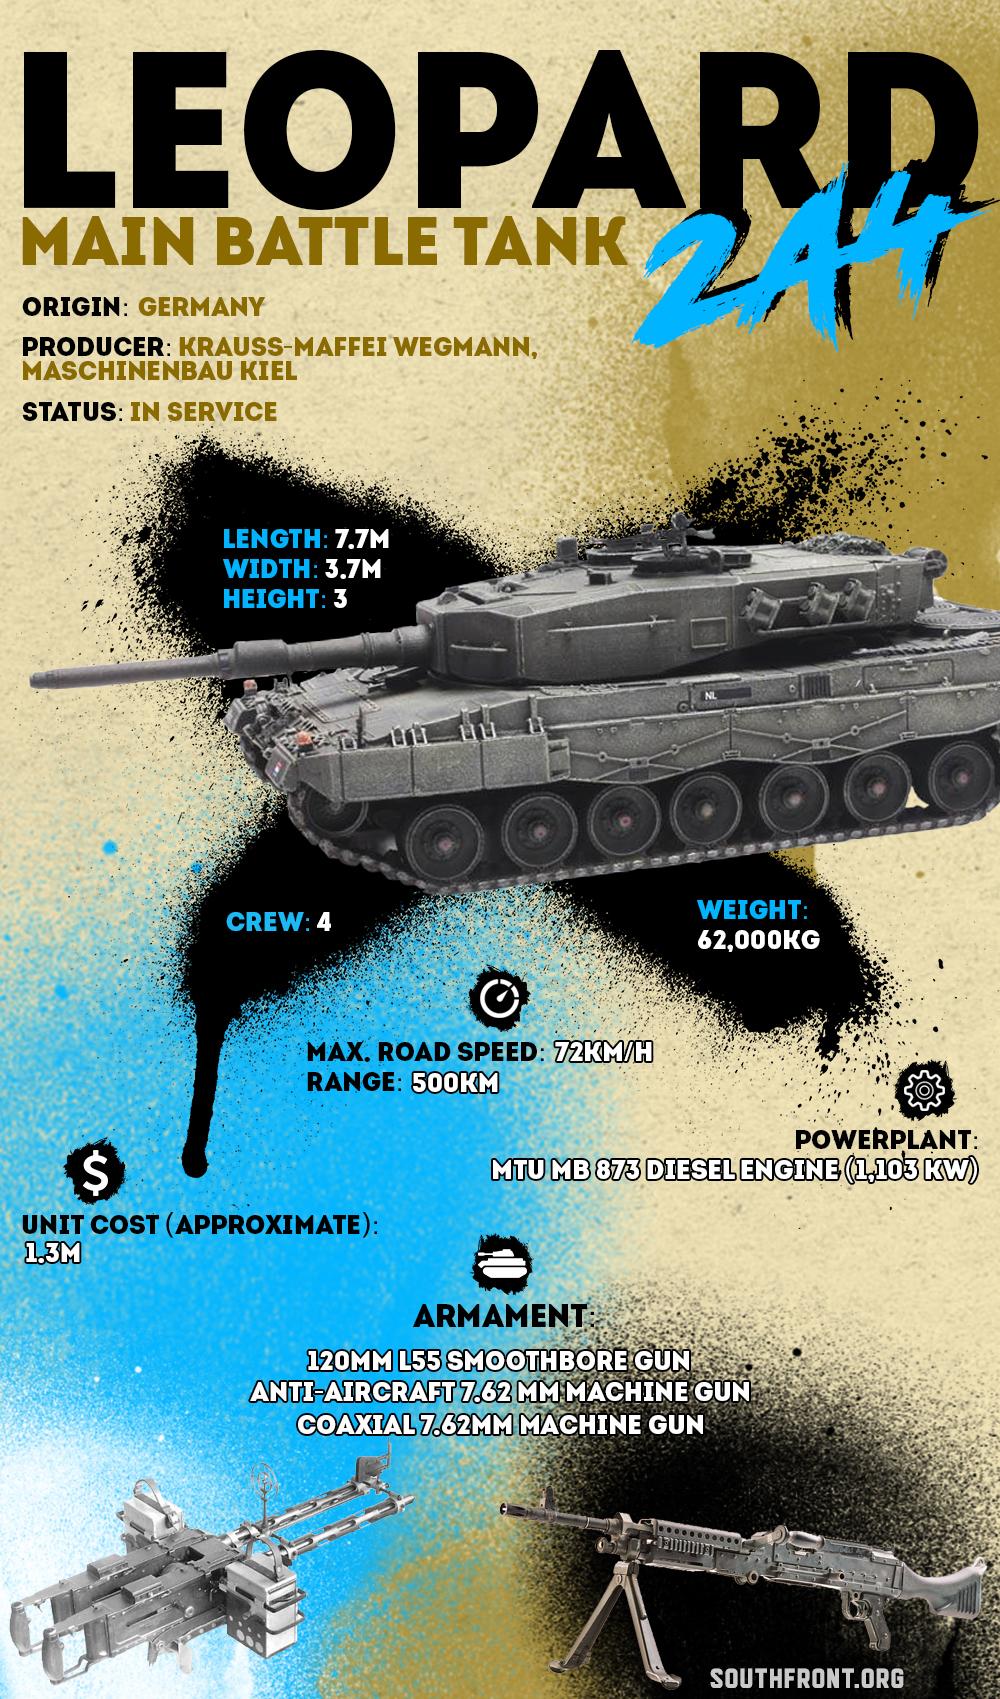 Turkey Deploys Leopard 2 Tanks On Border With Syria (Video)